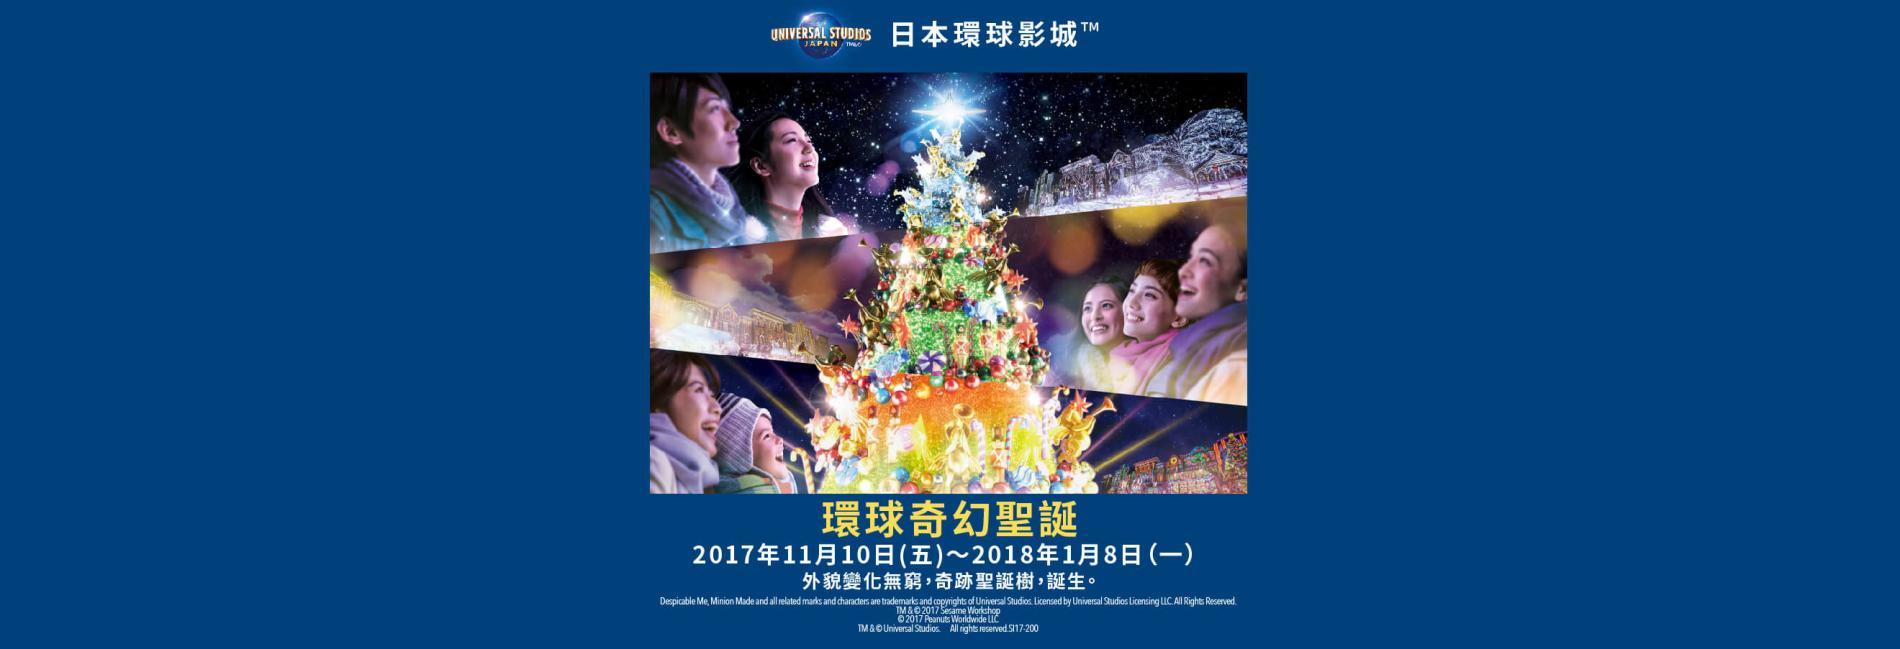 "UNIVERSAL STUDIOS JAPAN™: Studio Pass & Universal Express Pass"""